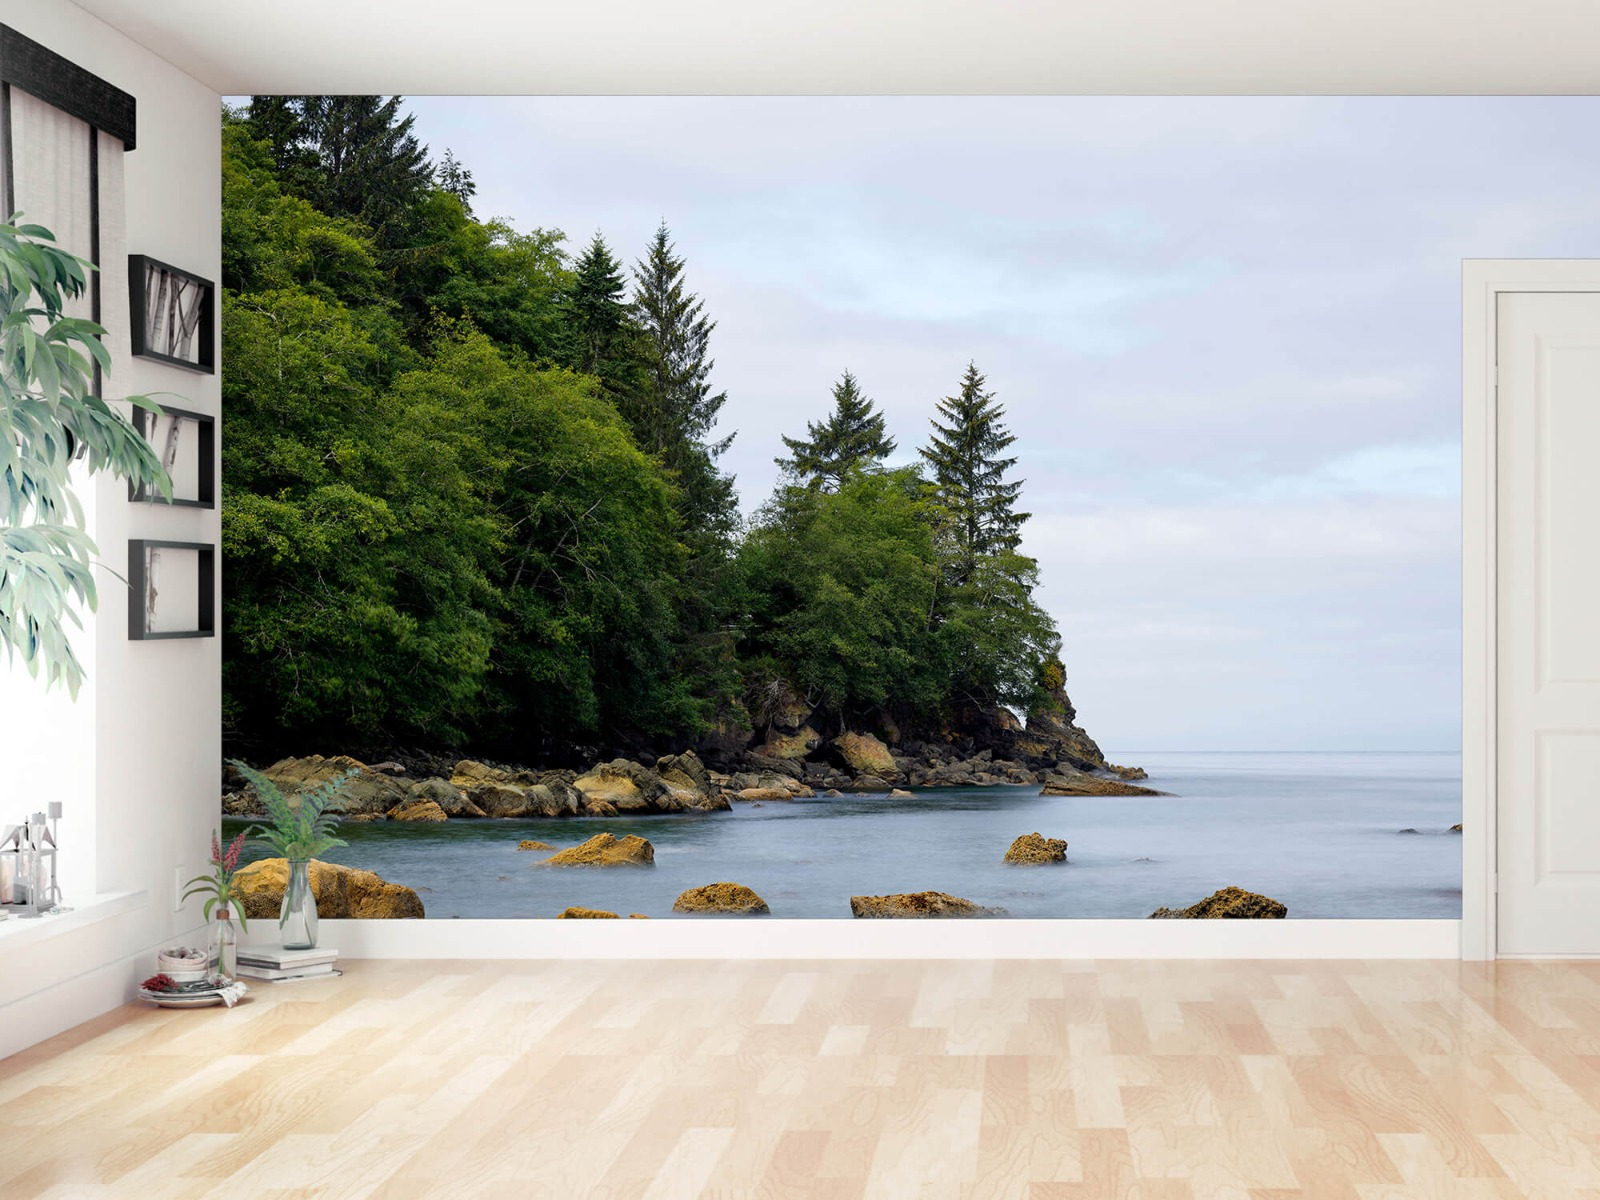 Bomen - Ruwe kustlijn - Slaapkamer 14